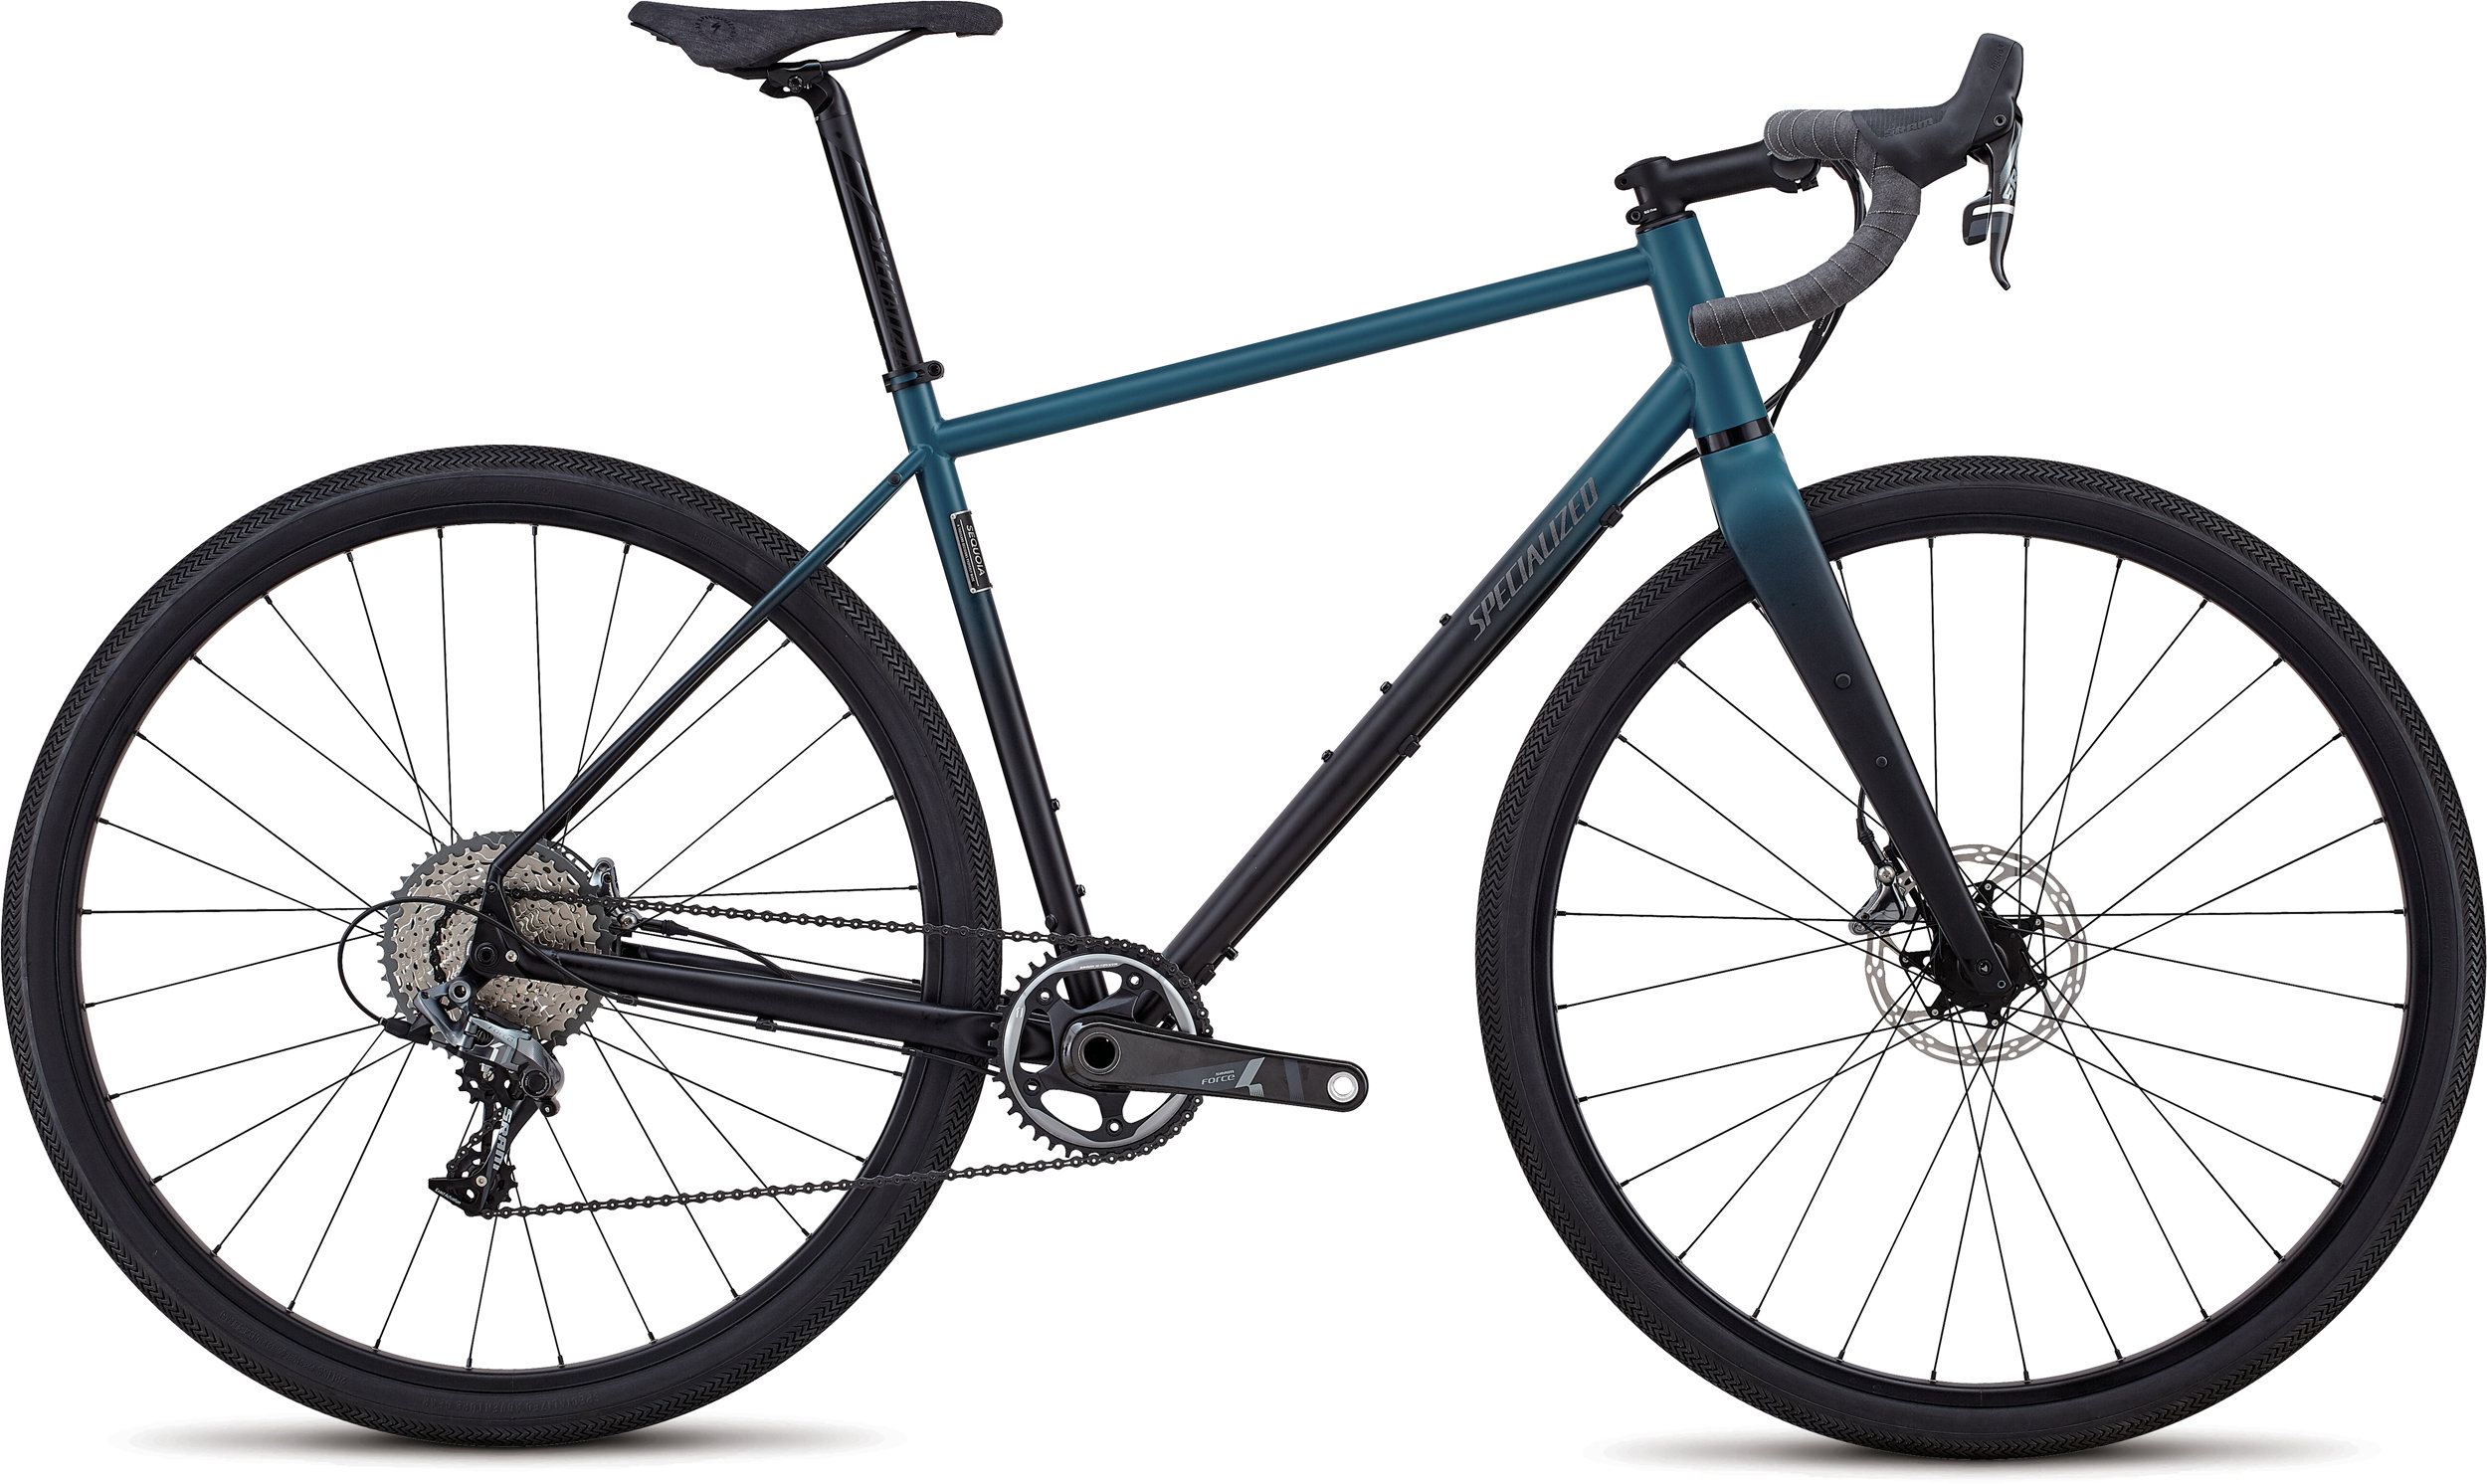 Specialized Sequoia Expert BLACK TROPICAL TEAL FADE 50 - Bike Maniac